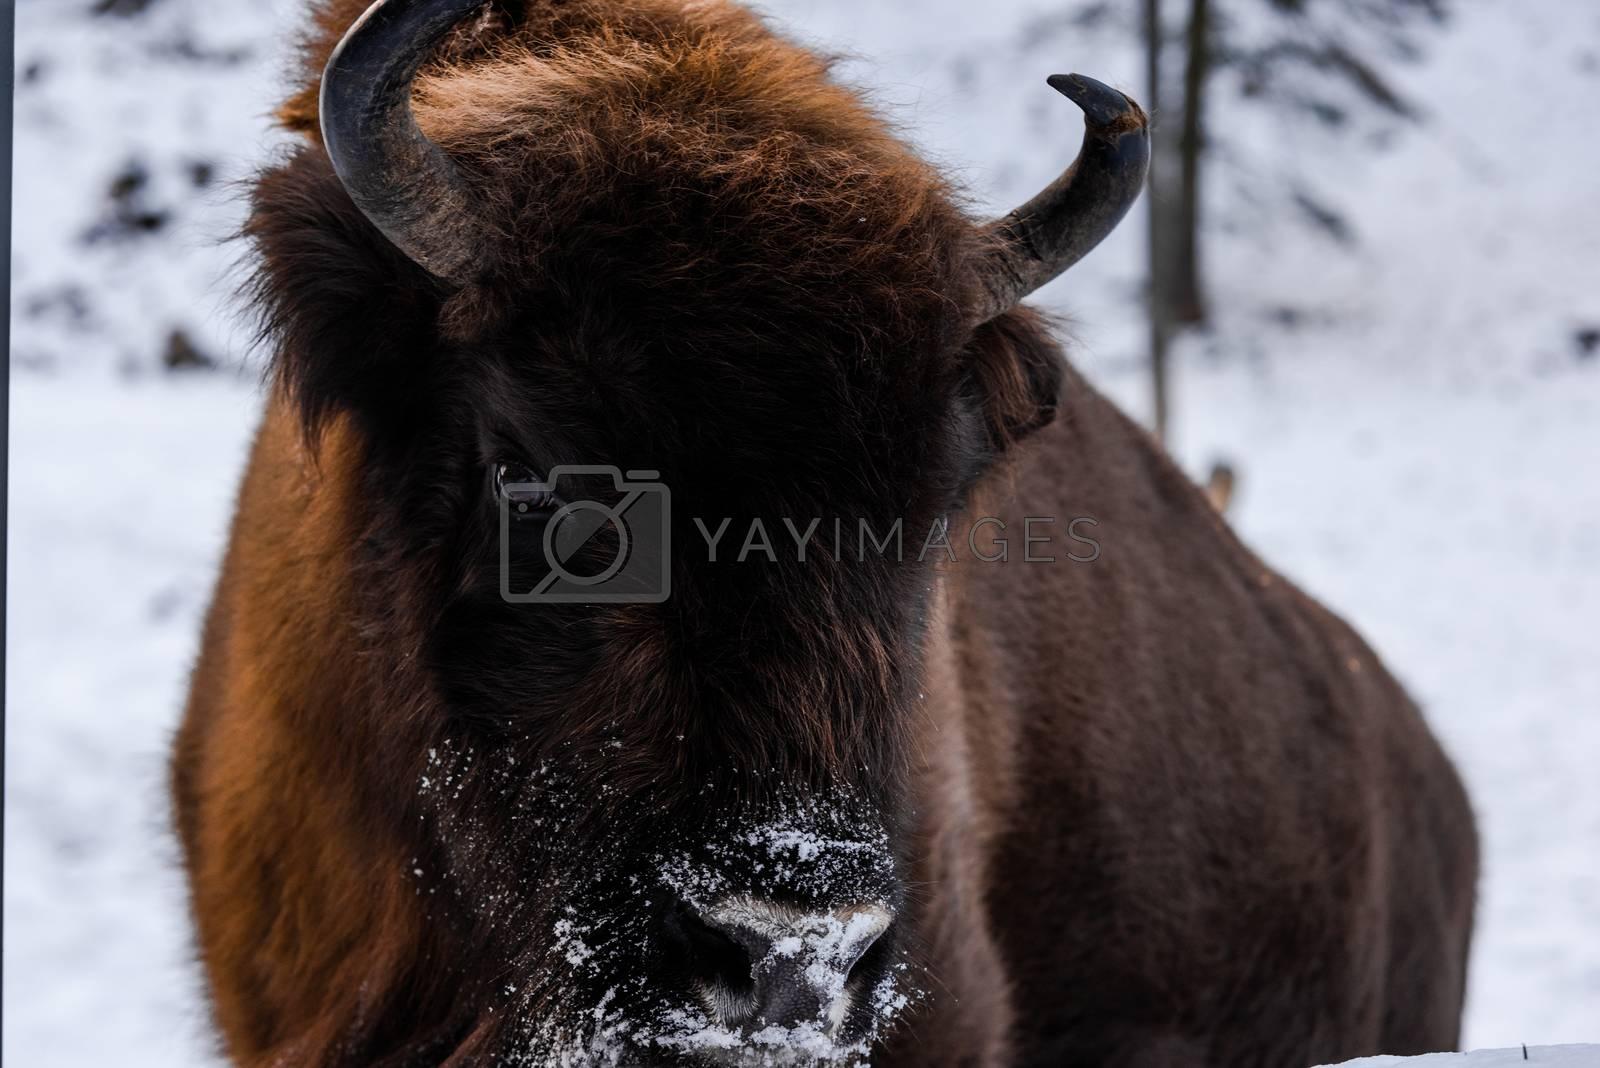 European bison (Bison bonasus) Close Up Portrait at Winter Season.